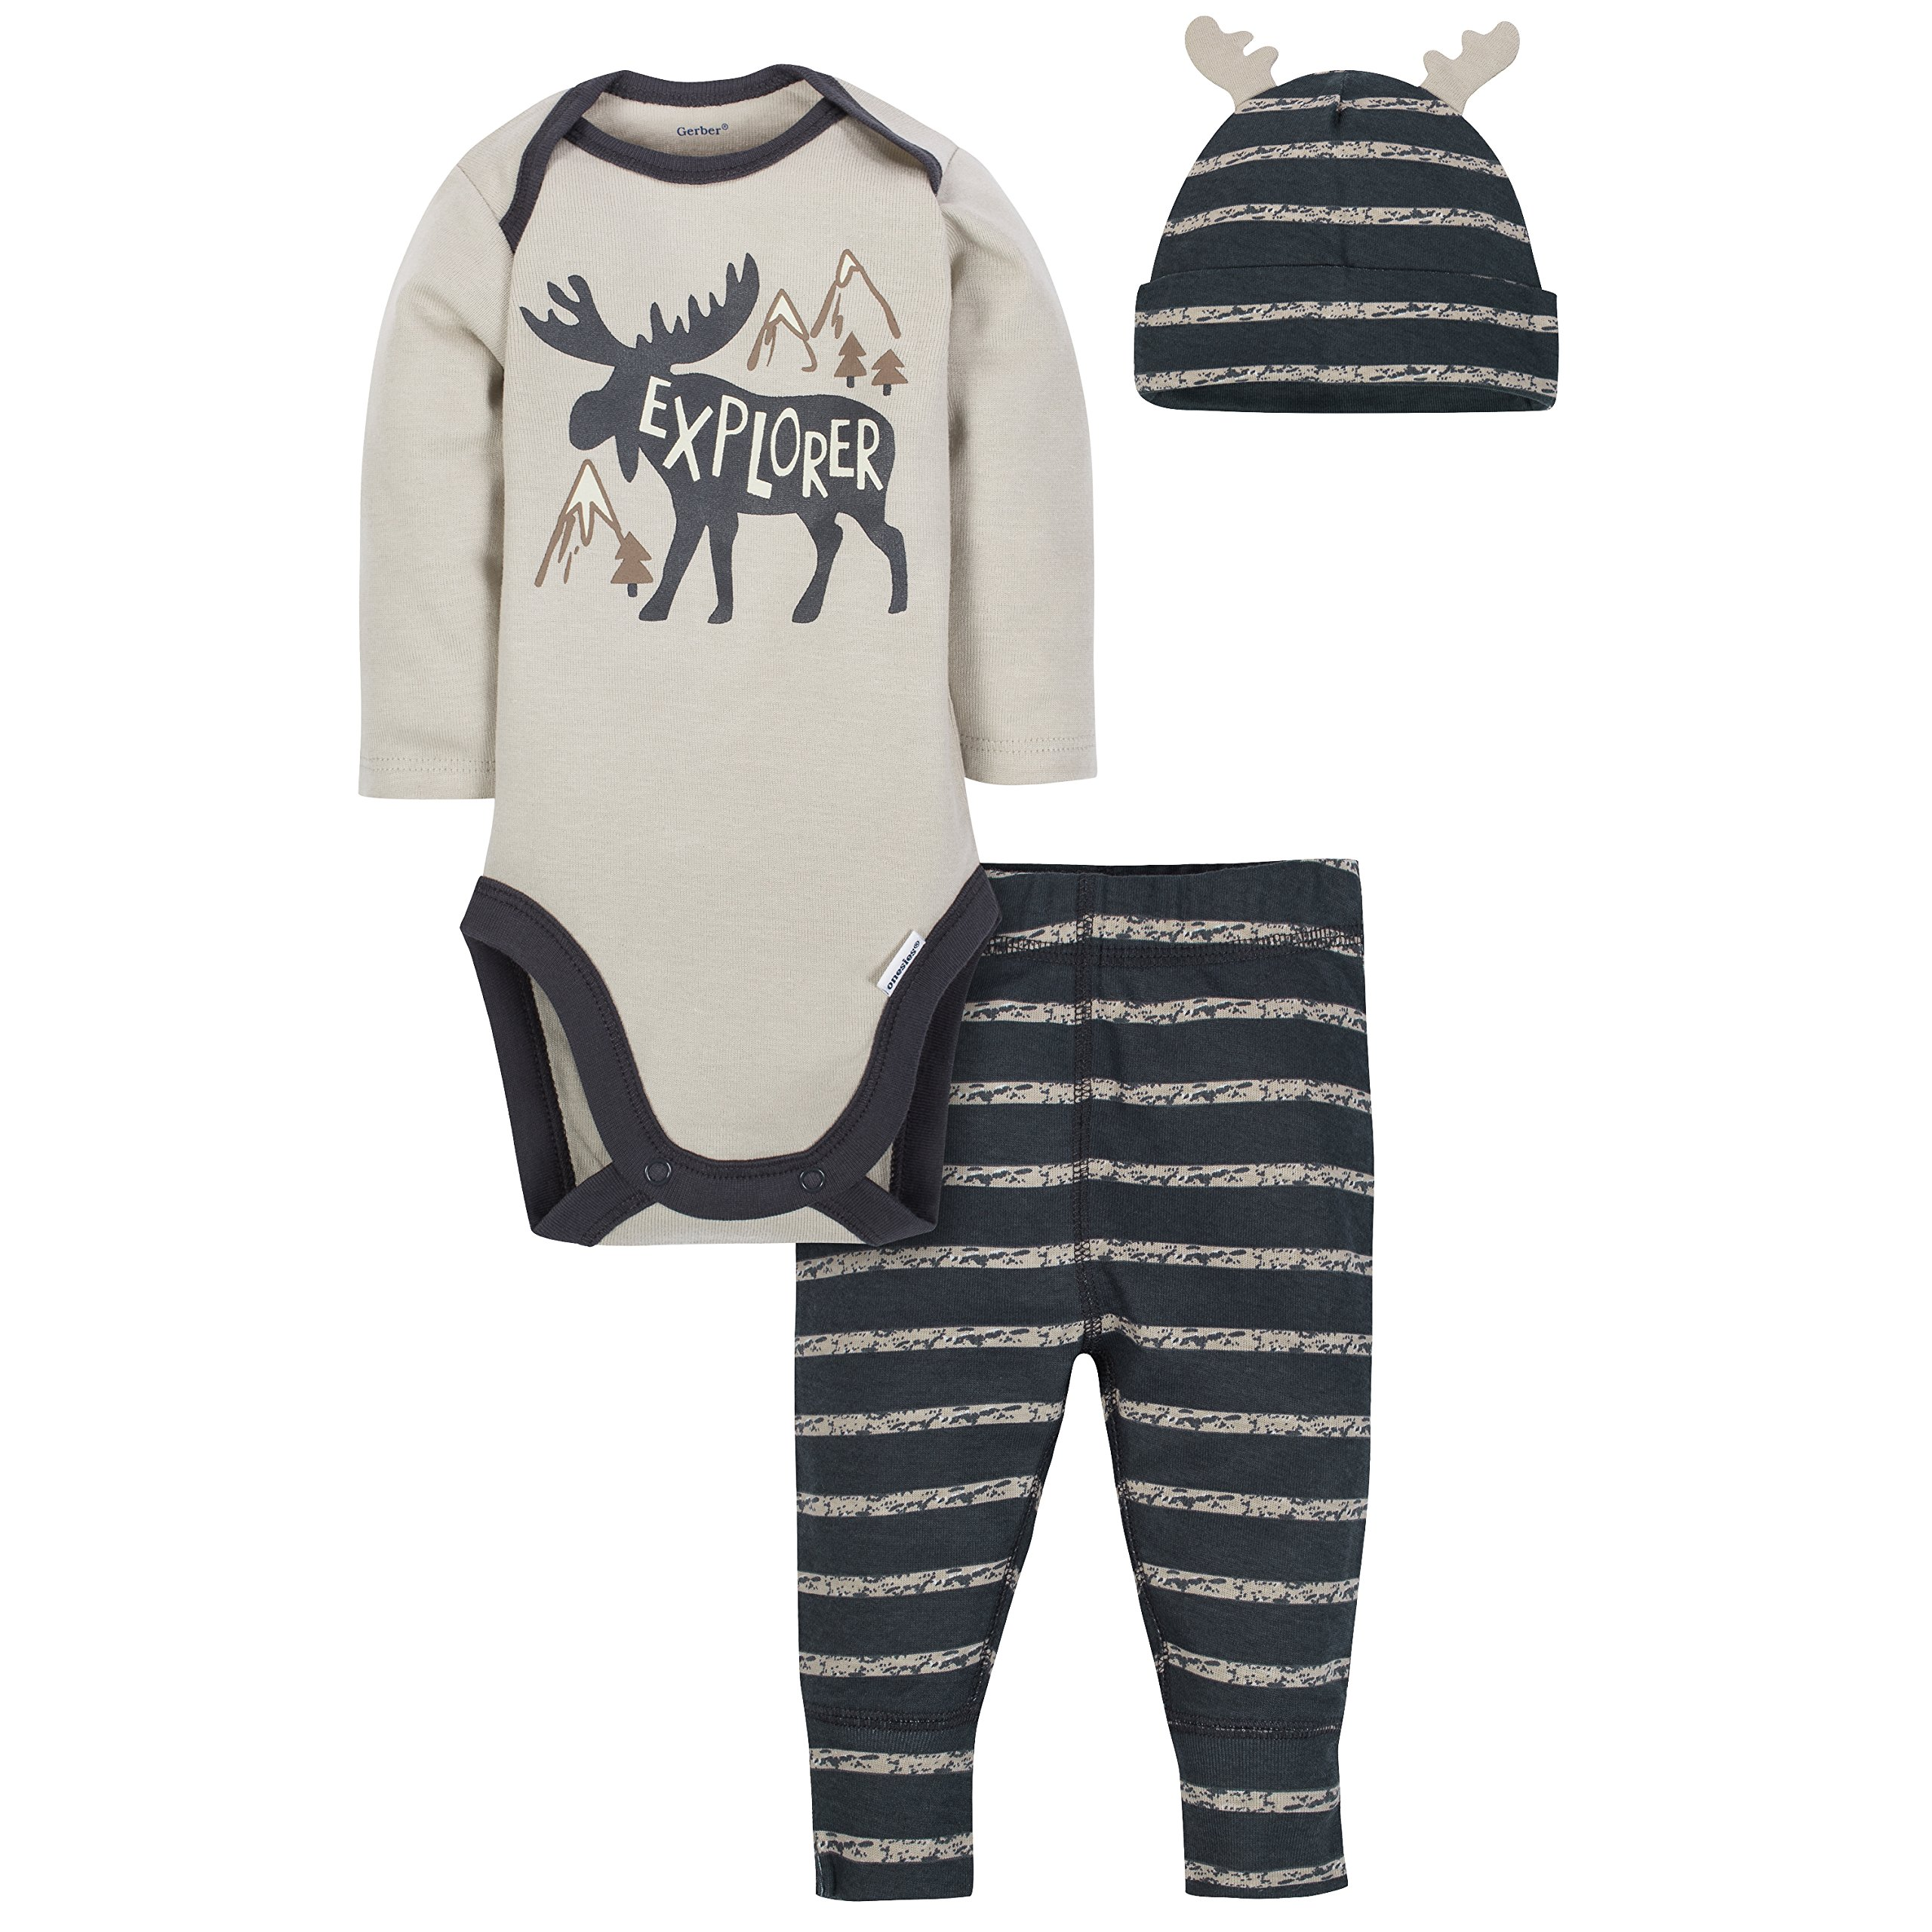 Gerber Baby Boys 3 Piece Bodysuit, Cap and Pant Set, Moose, 3-6 Months